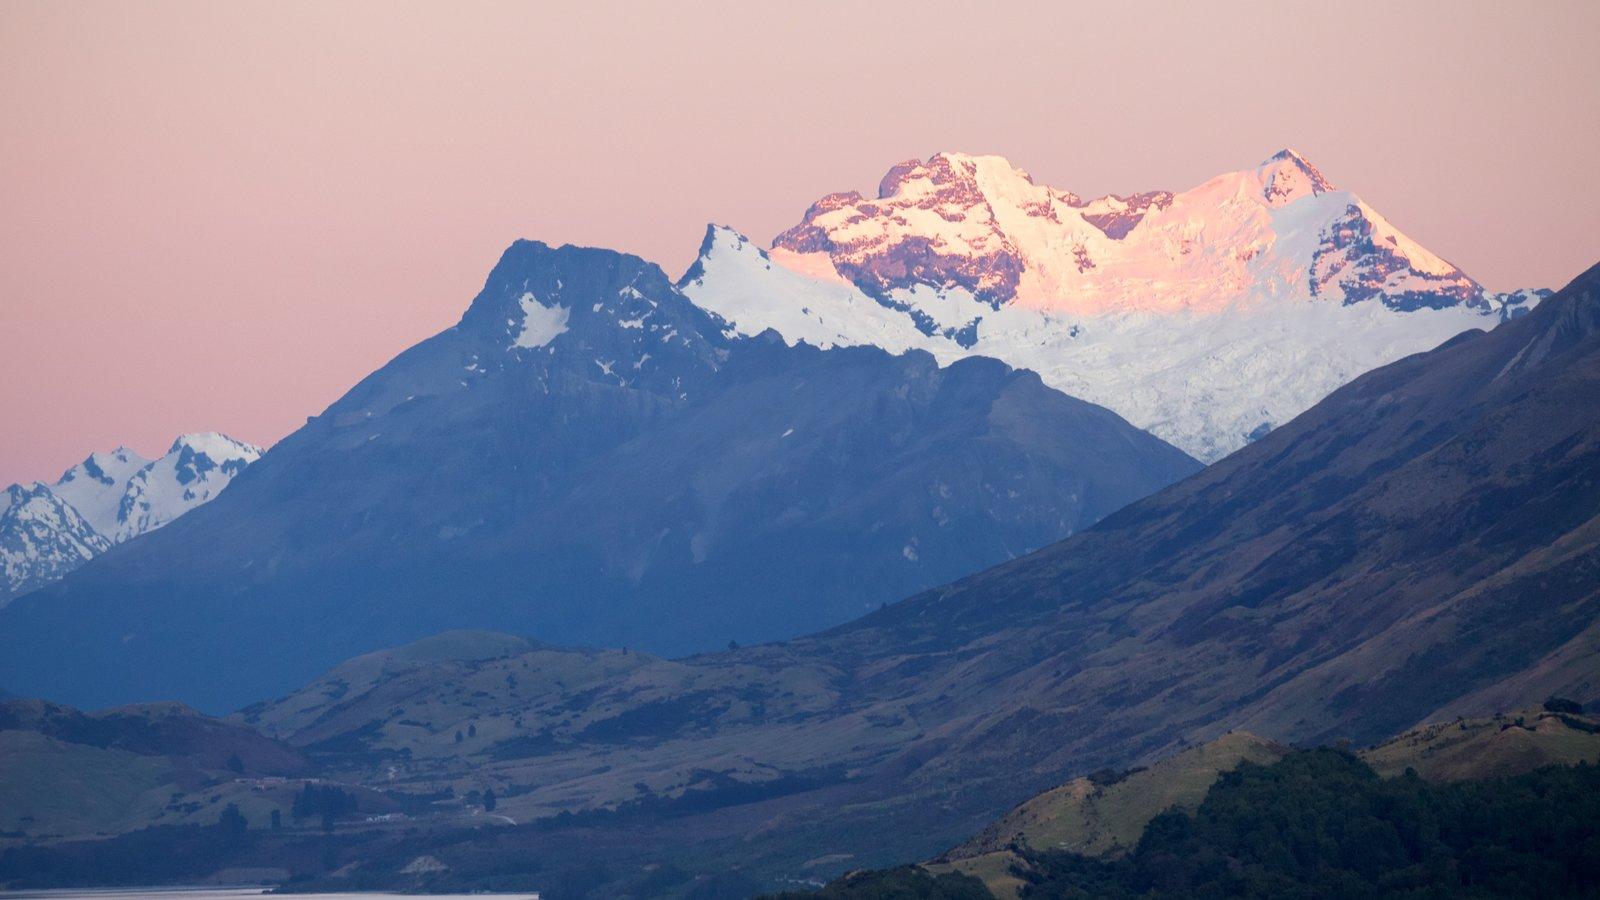 Lake Wakatipu showing a sunset, mountains and snow